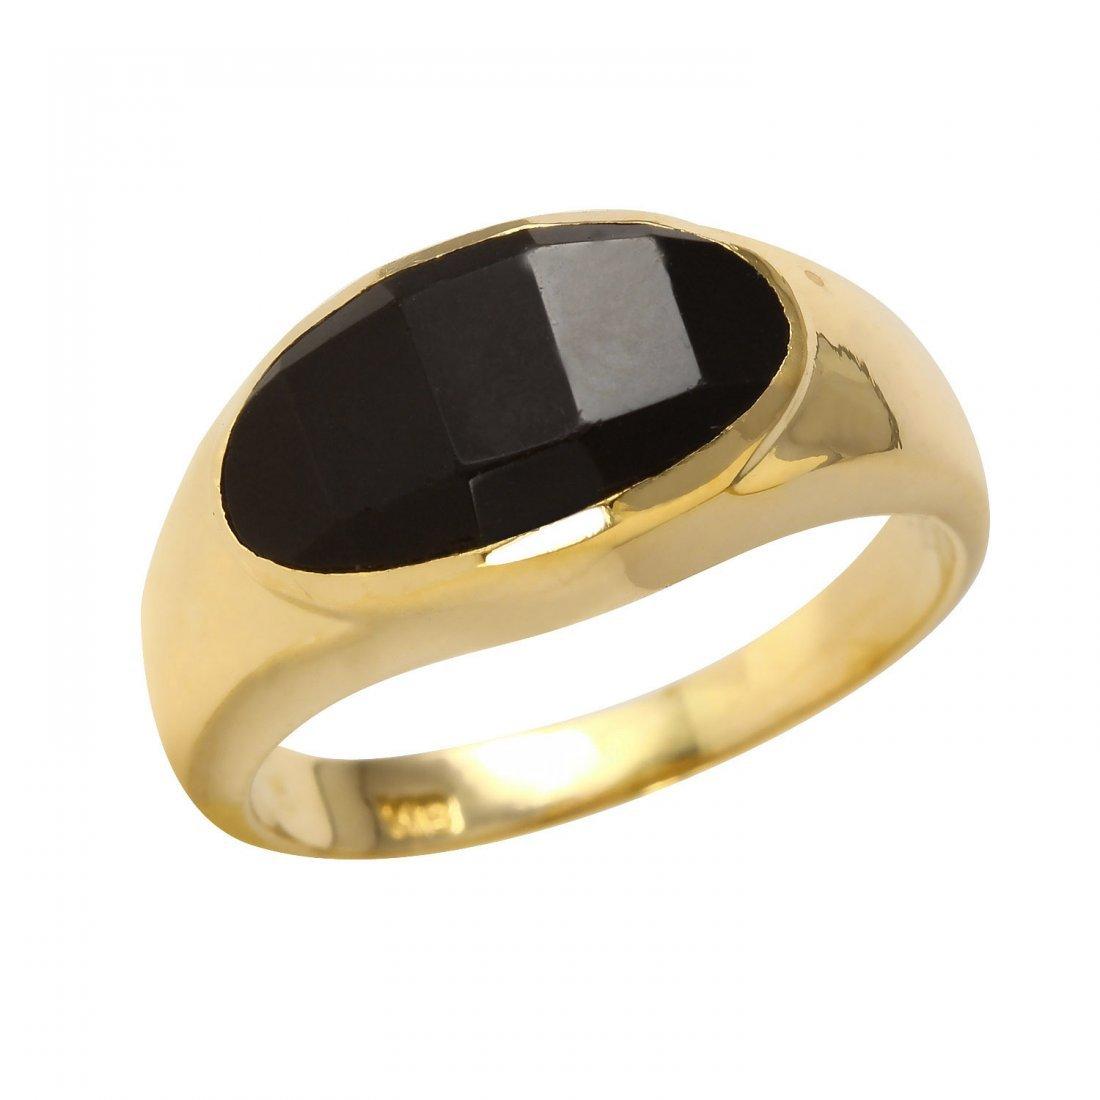 Ladies Onyx 18k Yellow Gold Ring